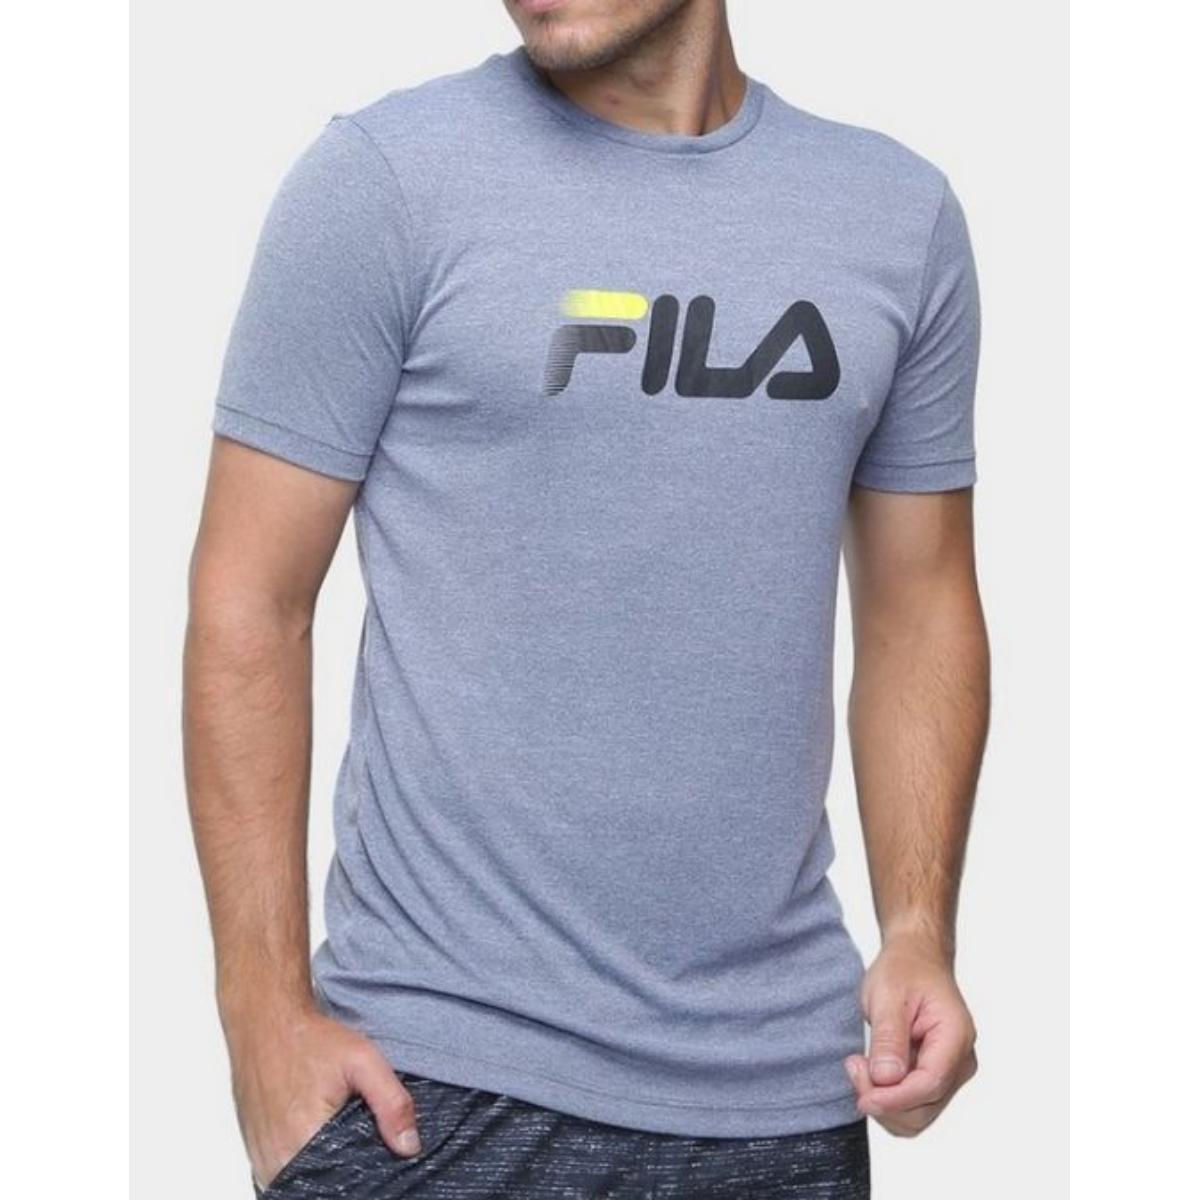 Camiseta Masculina Fila F11r518065.2350 Run go to Mars Cinza